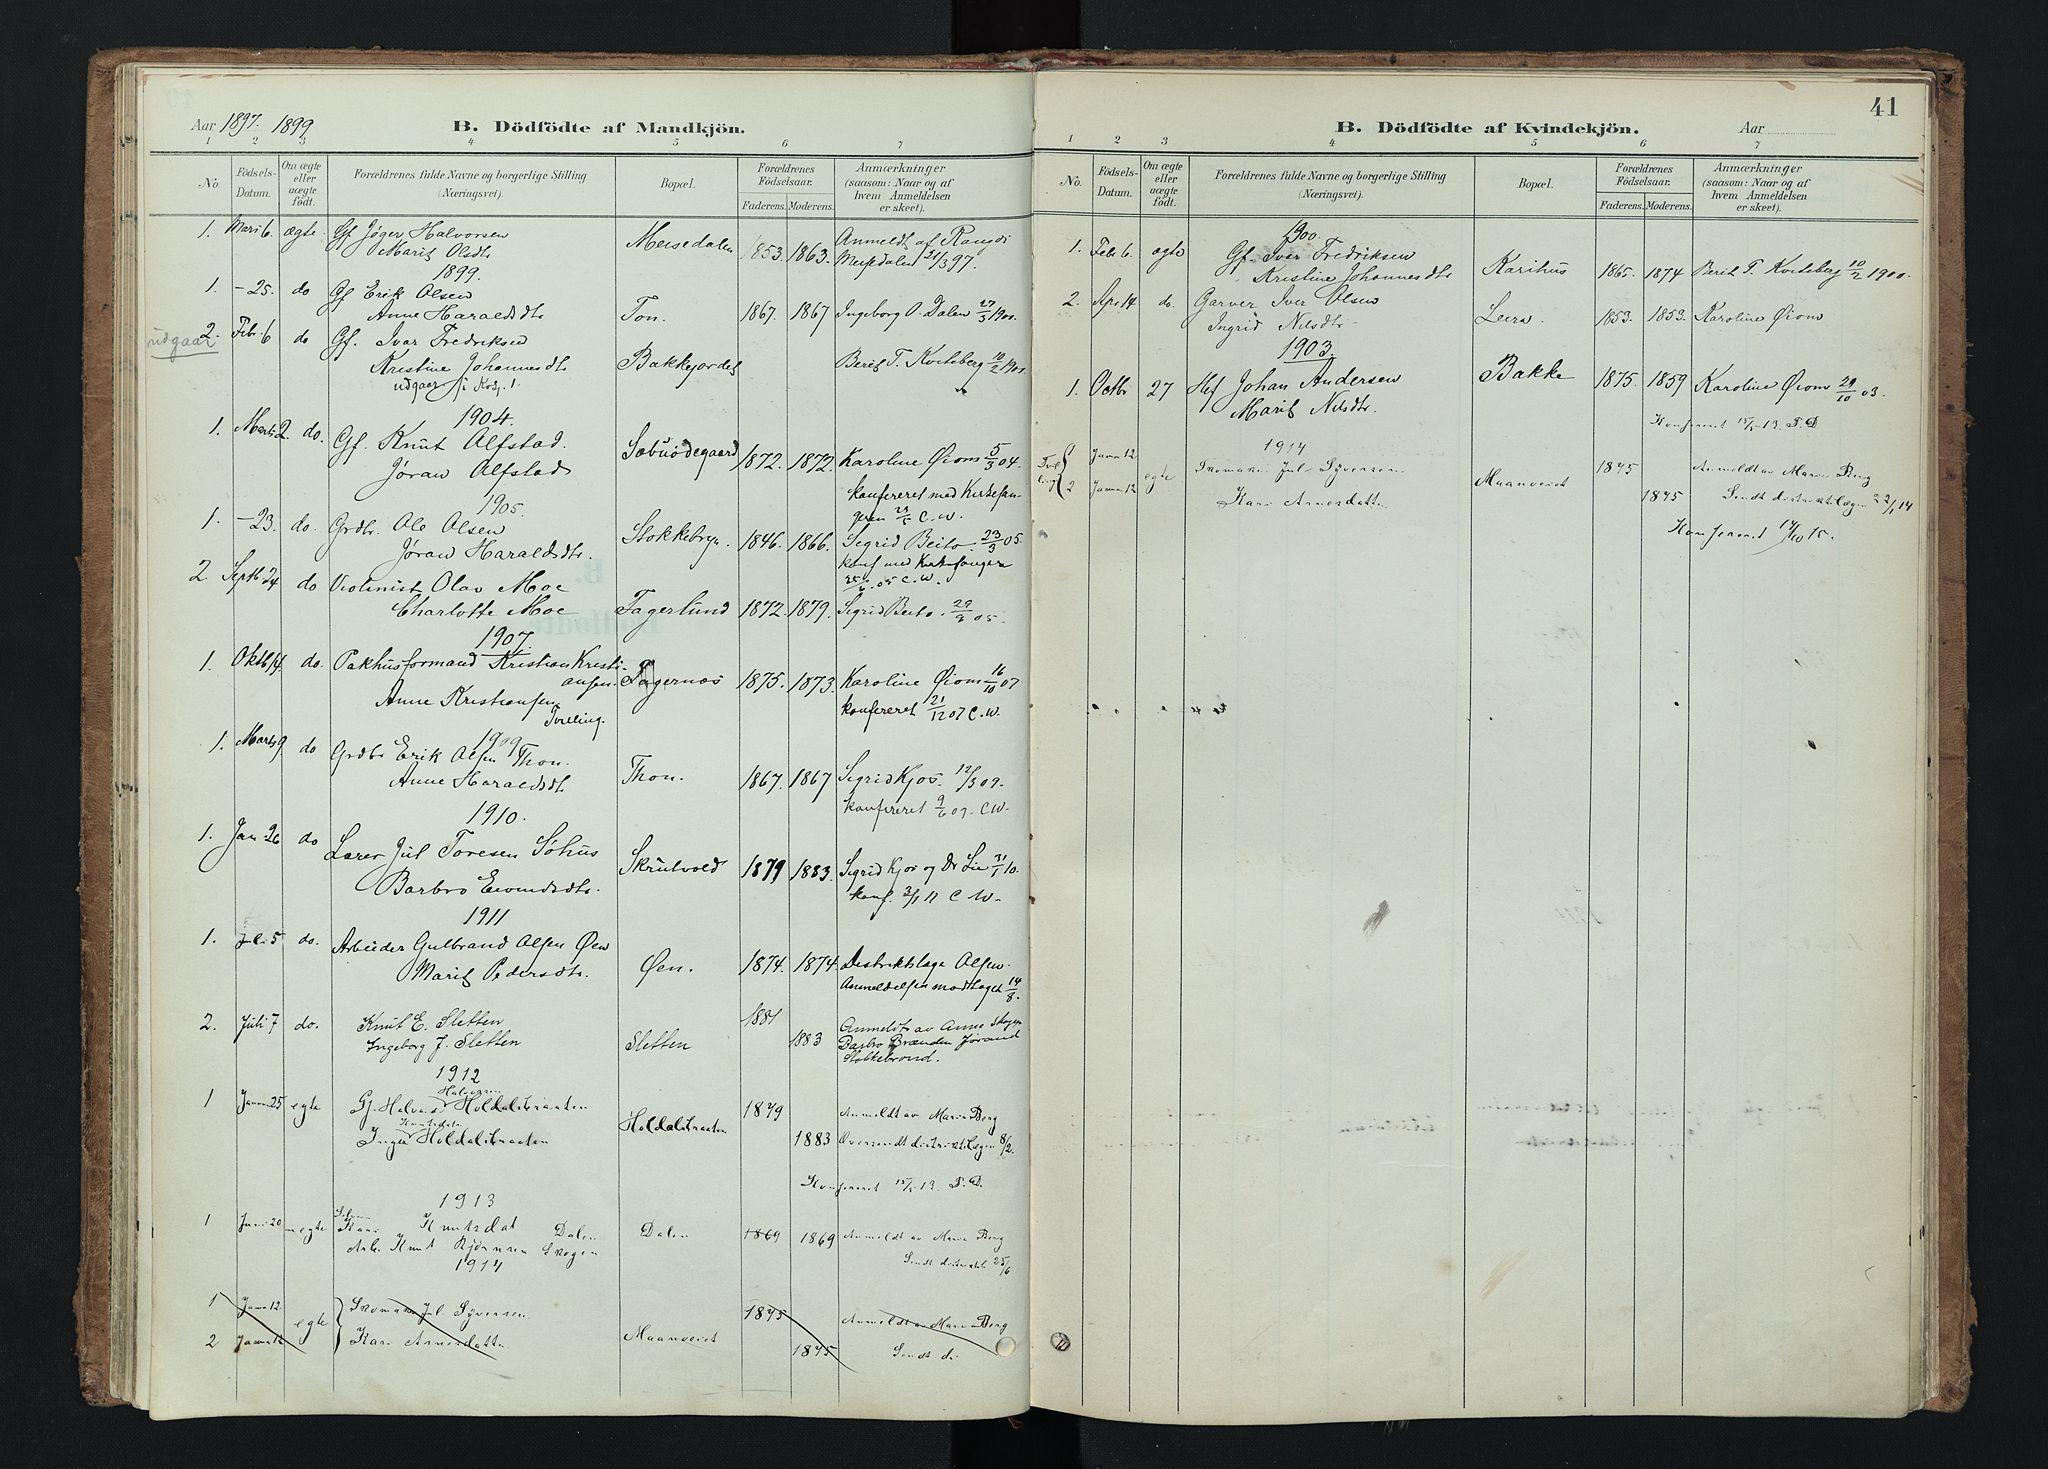 SAH, Nord-Aurdal prestekontor, Ministerialbok nr. 15, 1896-1914, s. 41